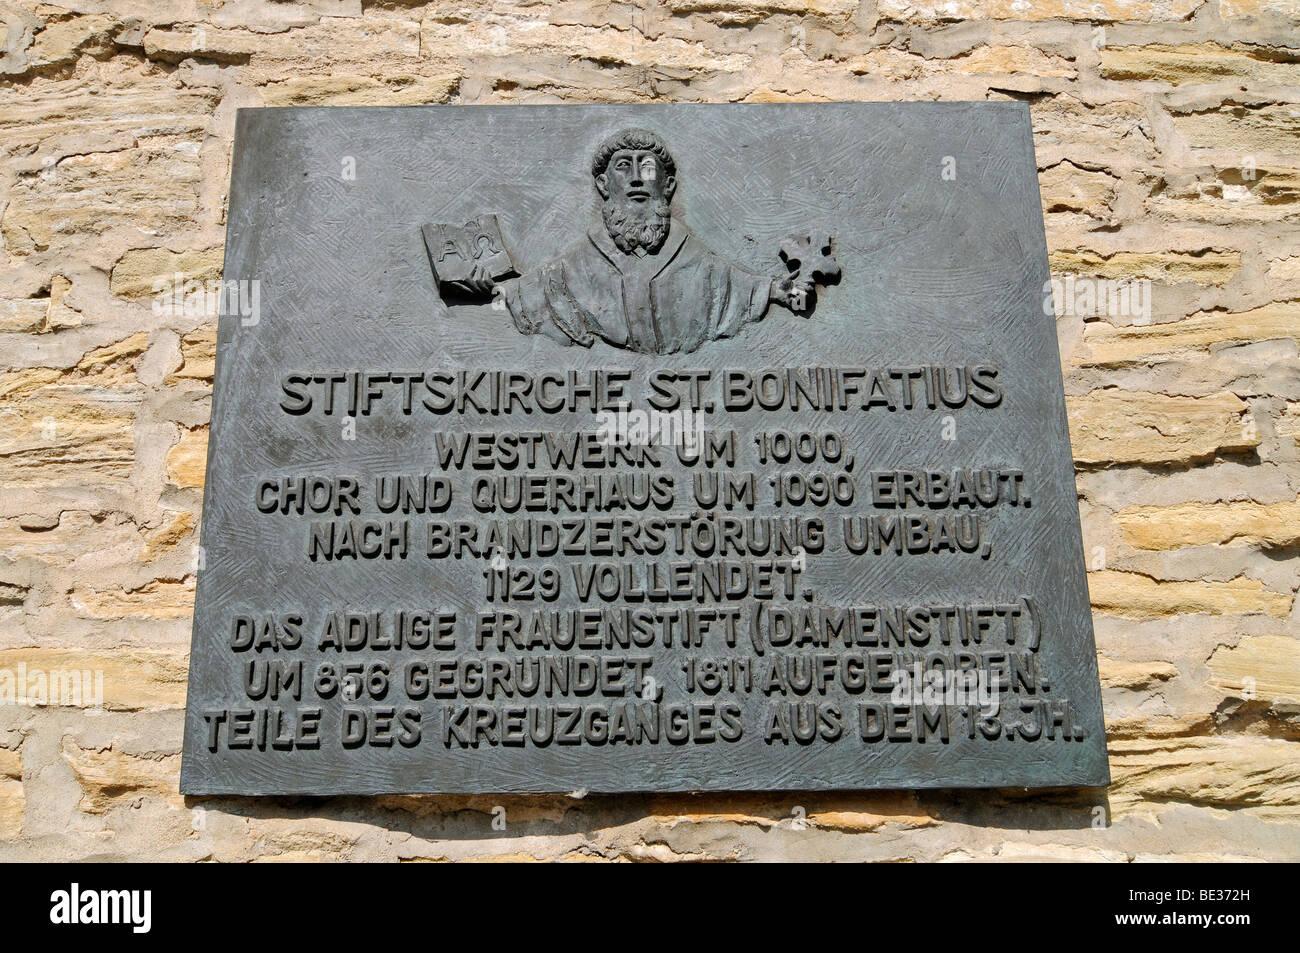 Sign, Stiftskirche St Bonifatius collegiate church, monastery, church, Freckenhorst, Warendorf, Muensterland region, - Stock Image